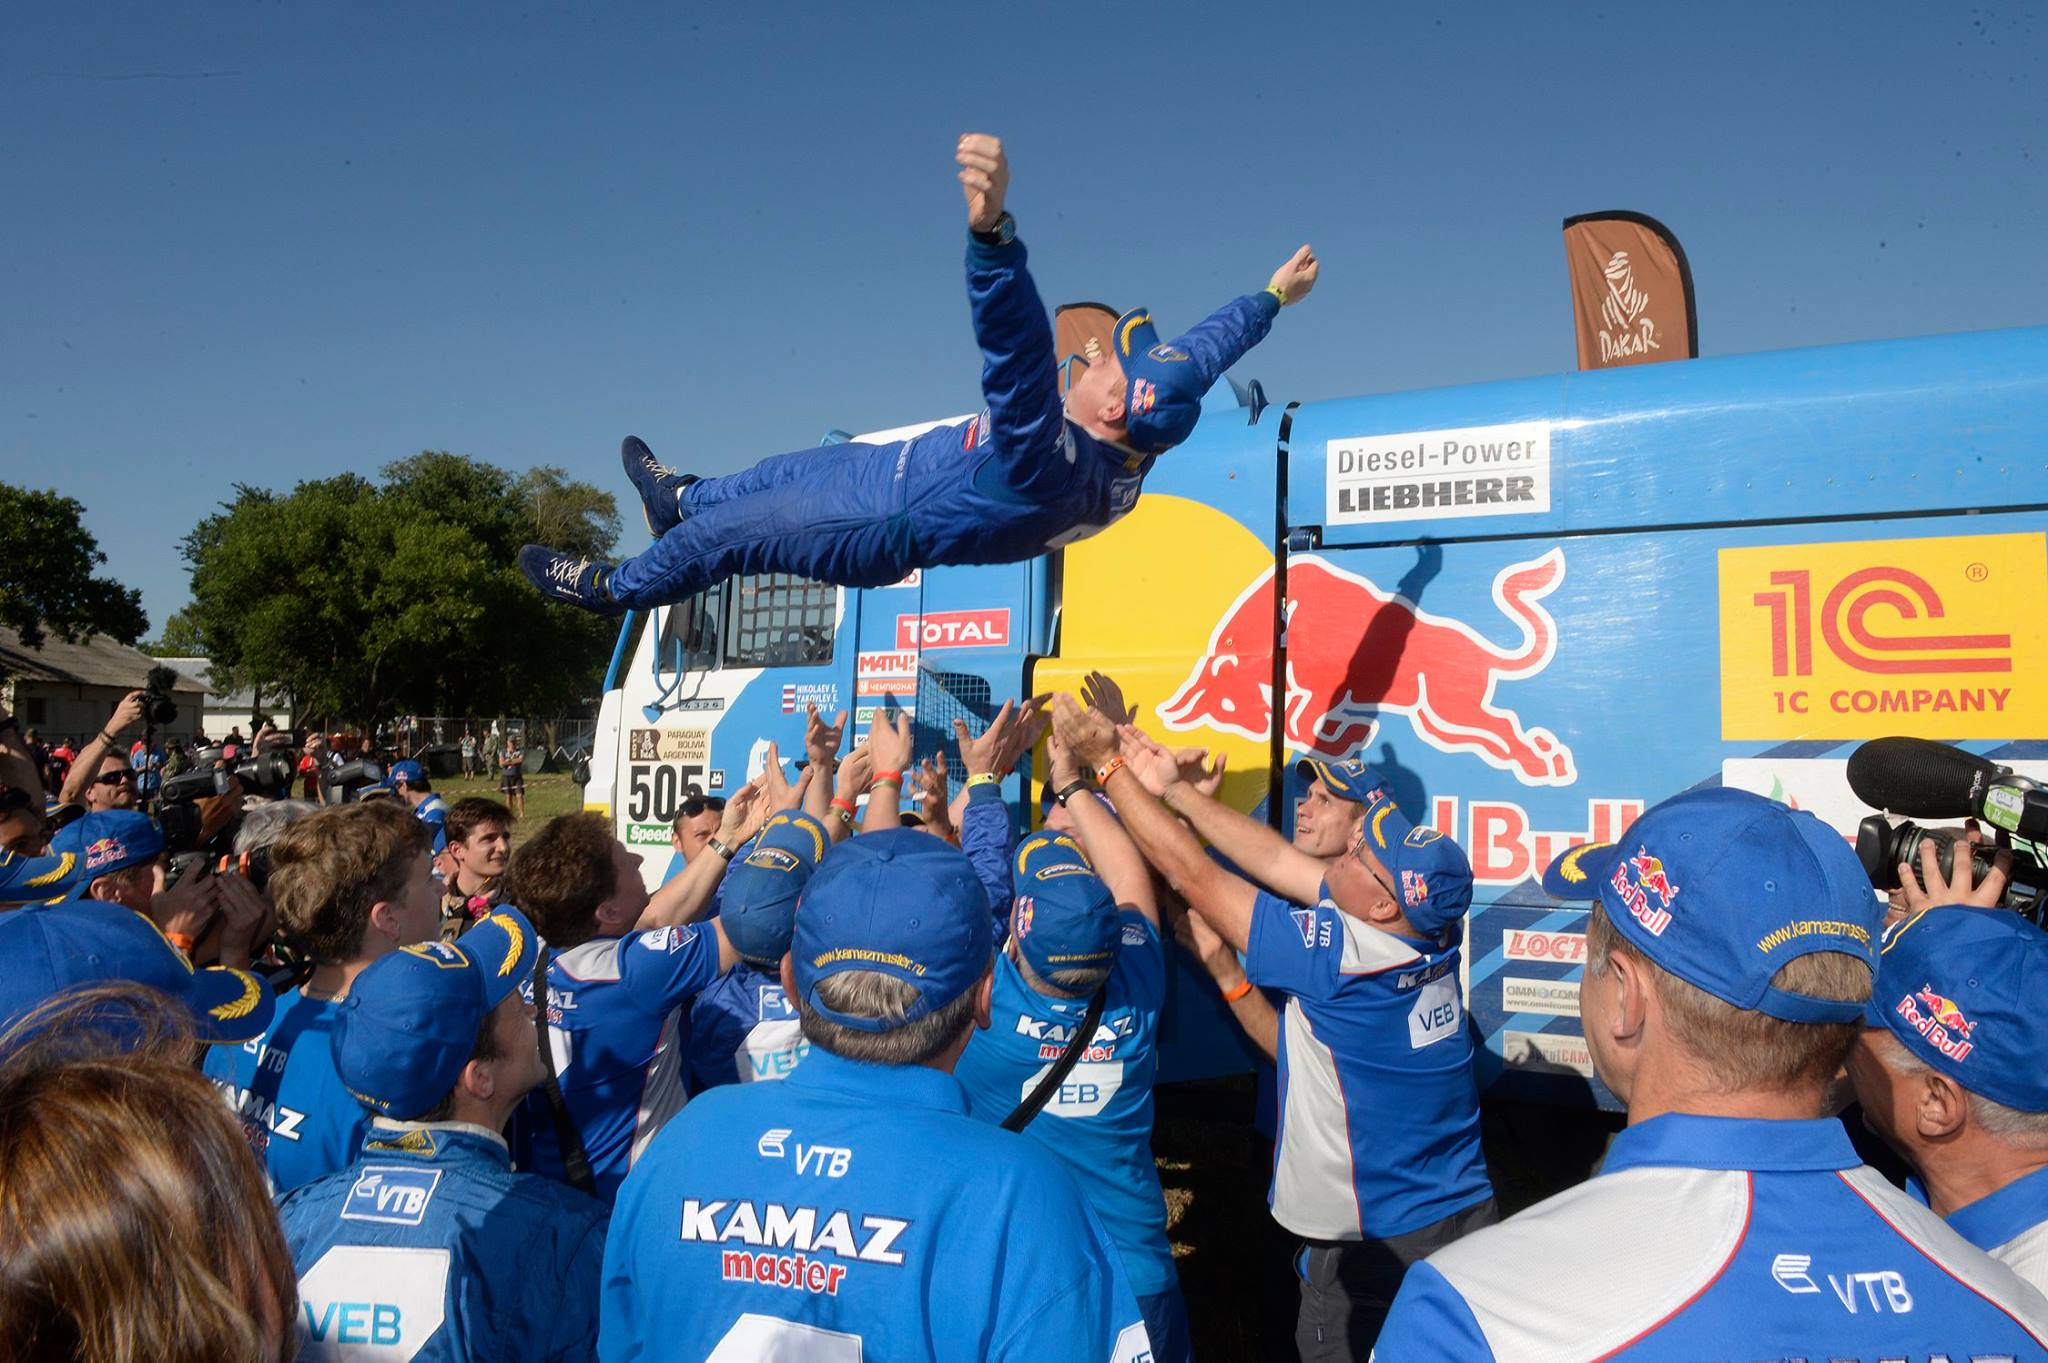 КАМАЗ Дакар 2017 Dakar KAMAZ